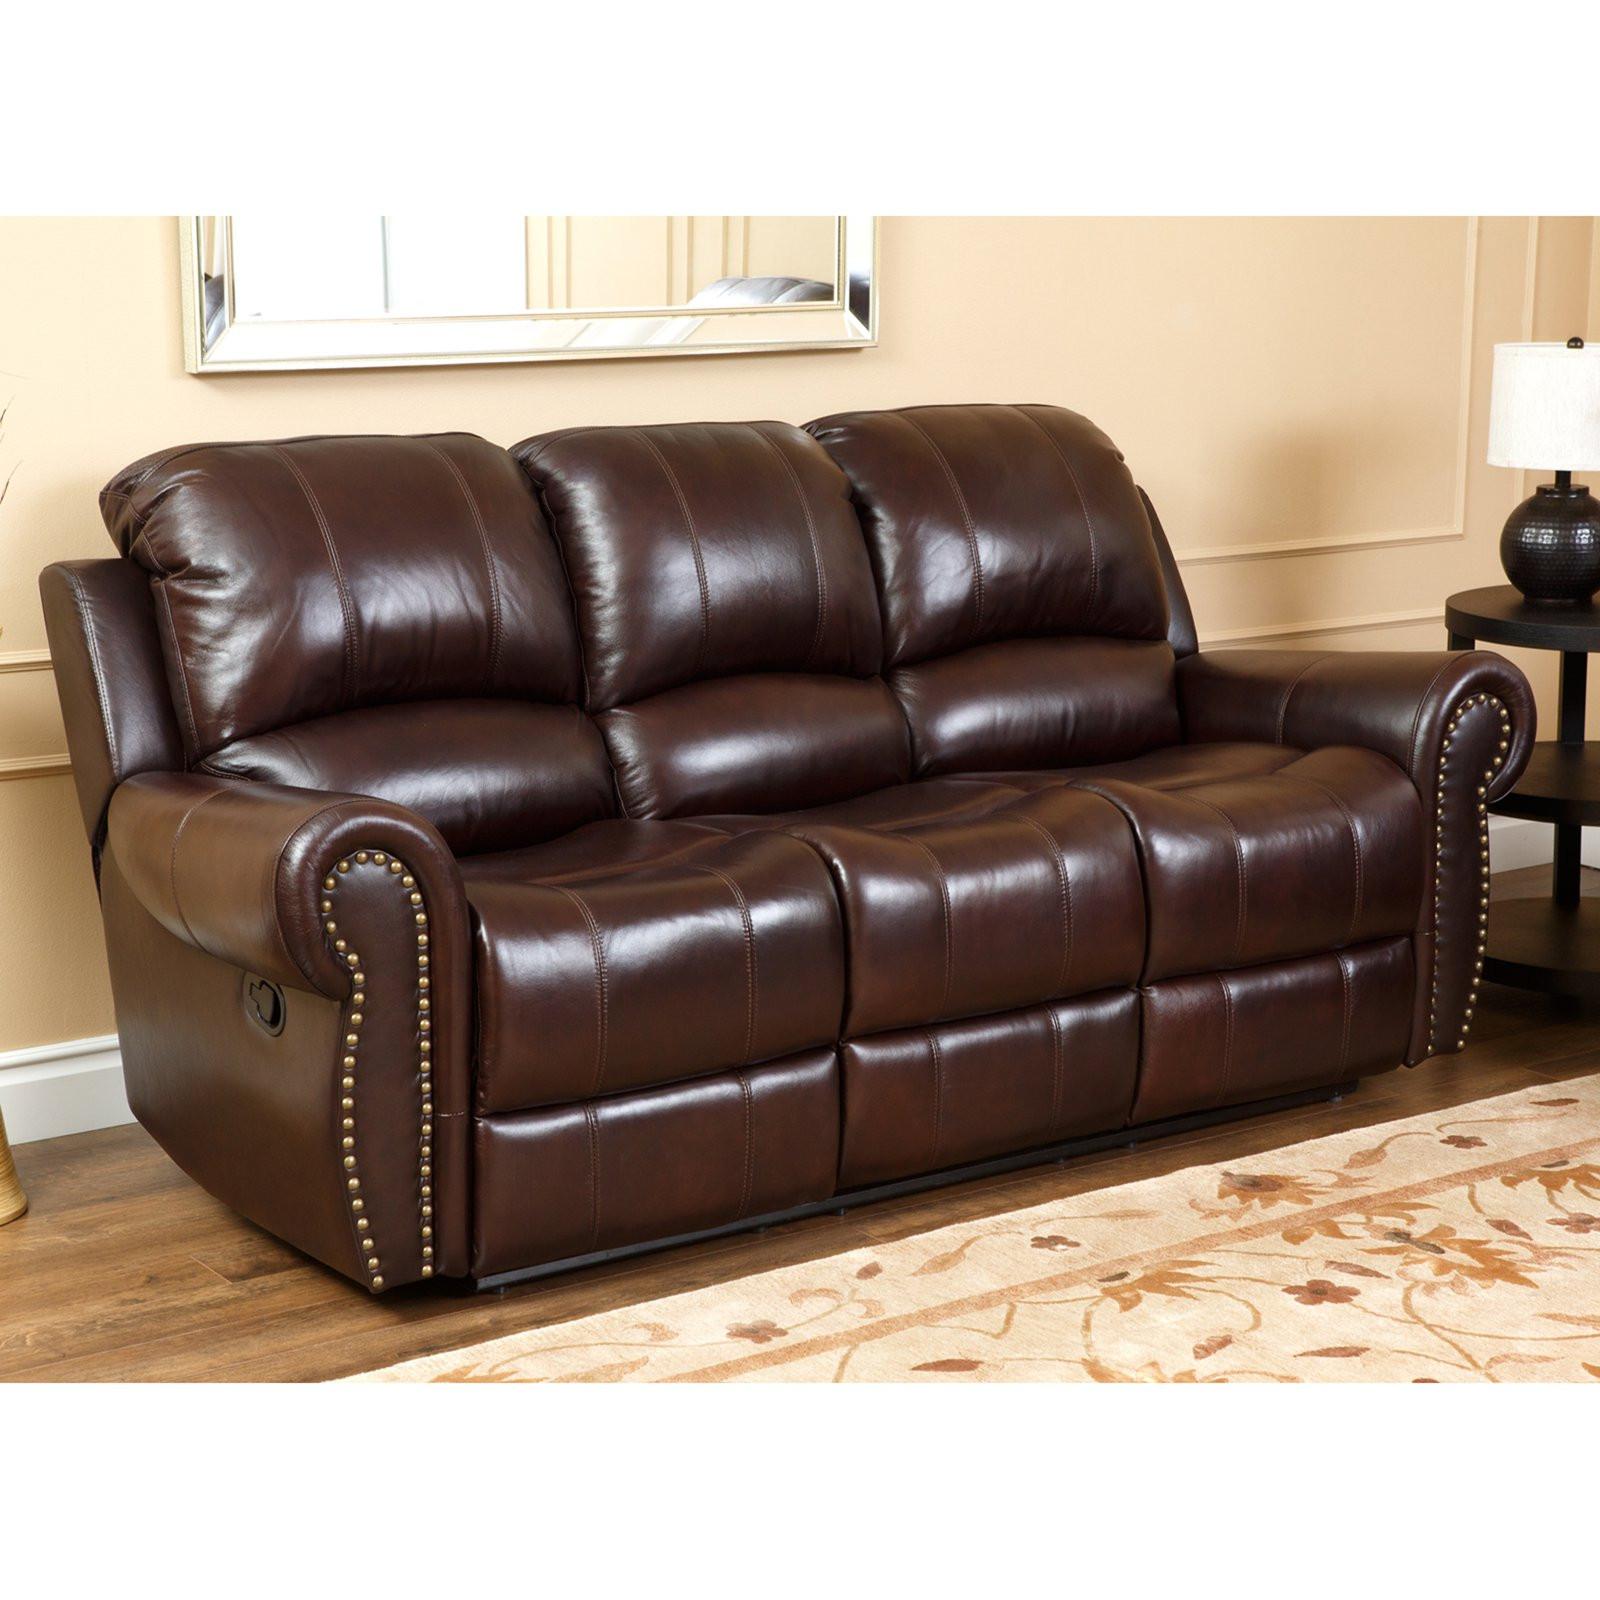 Best ideas about Italian Sofa Set . Save or Pin Abbyson Lexington Dark Burgundy Italian Leather Reclining Now.